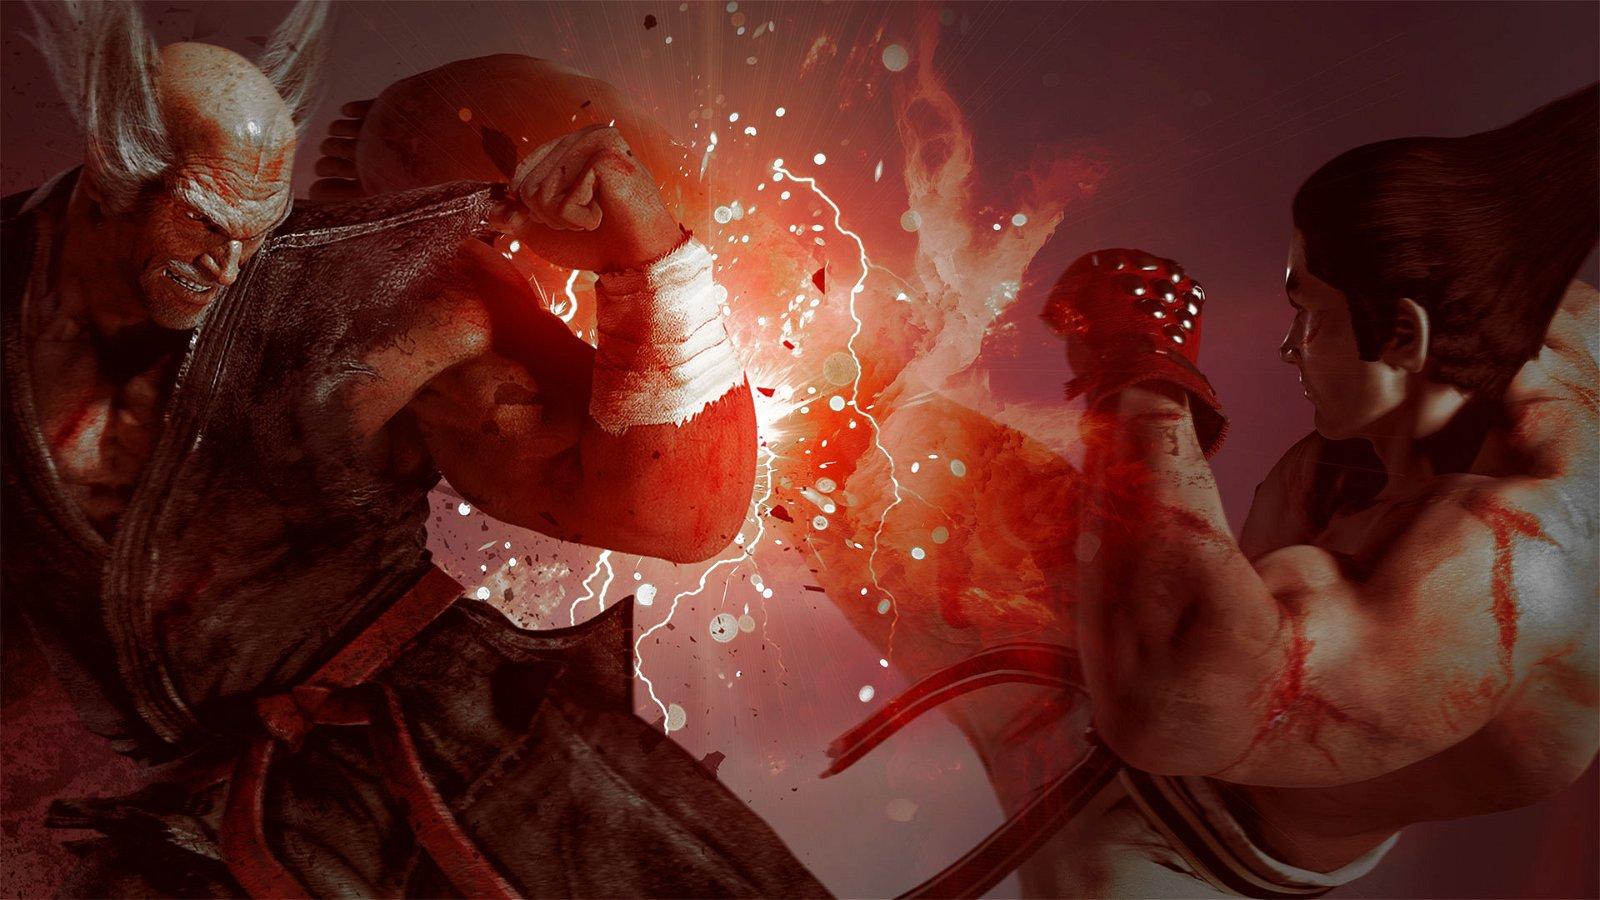 Tekken 7 Review - Great Mechanics, Barebone Presentation 7